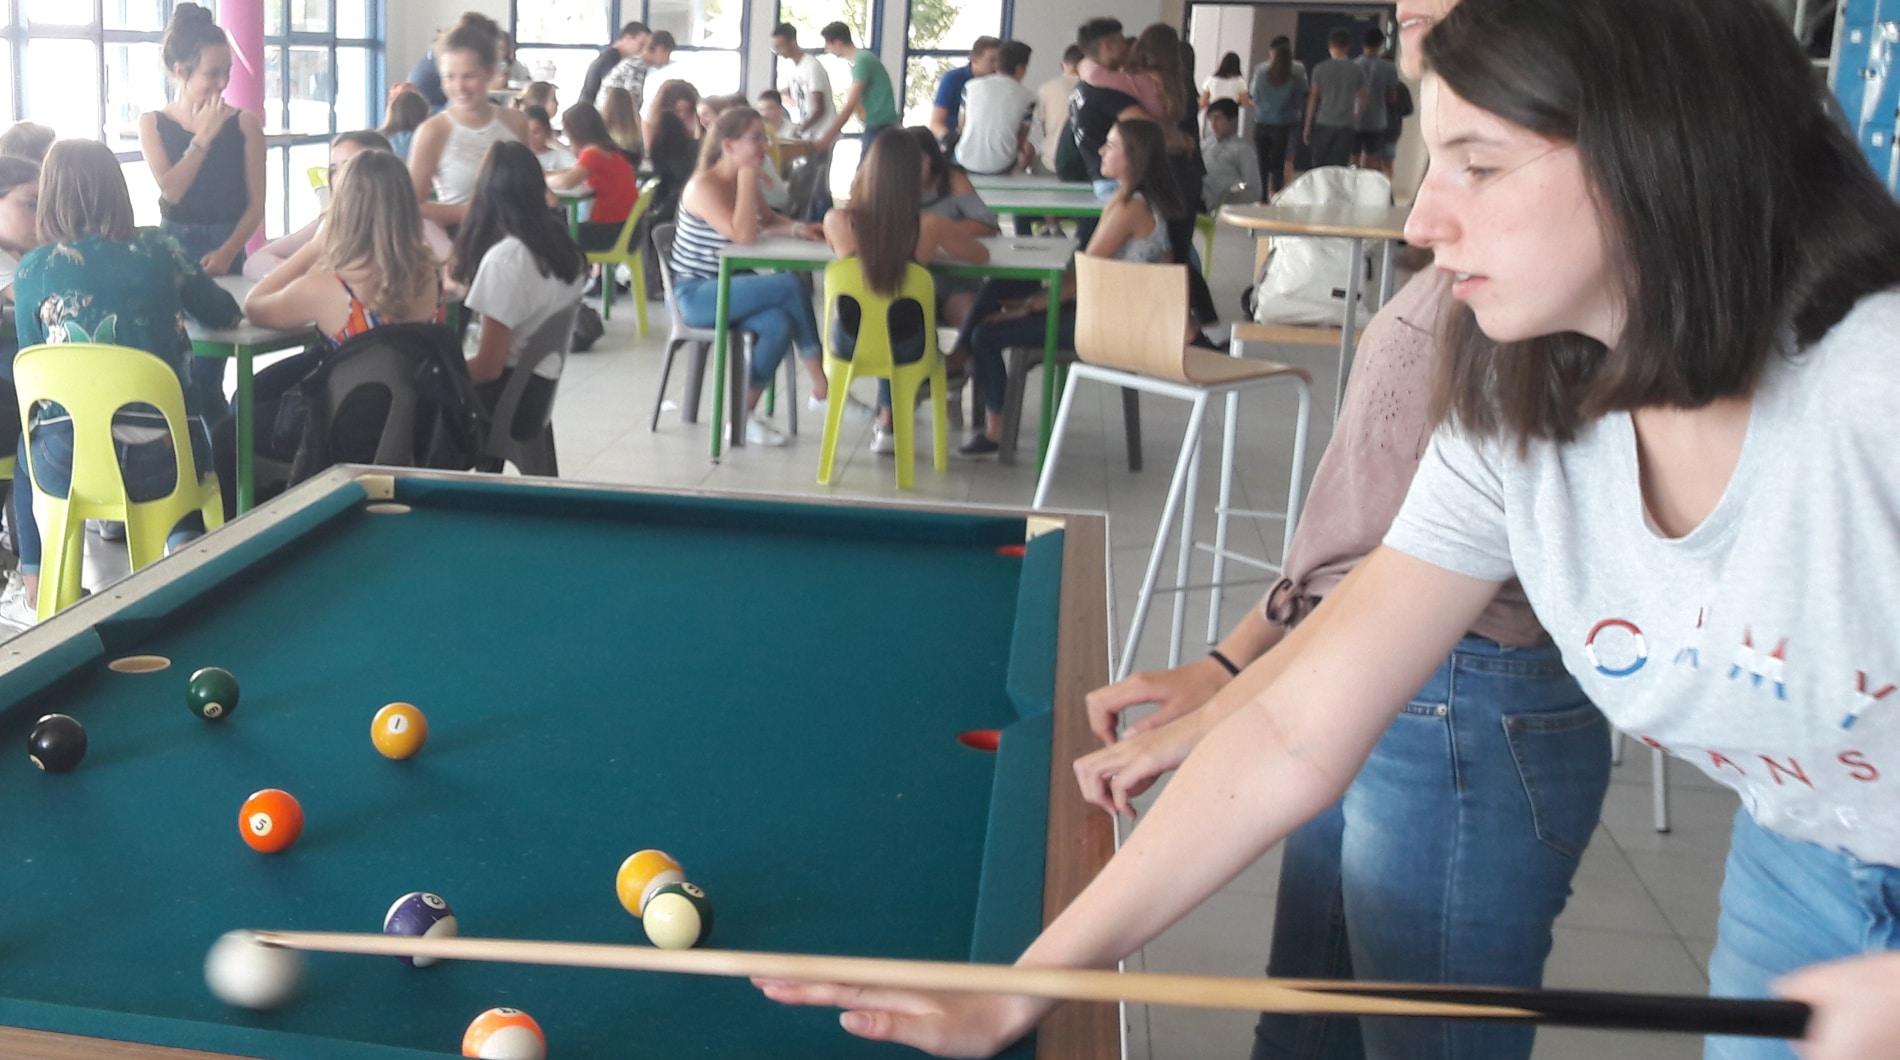 élèves jouant au billard